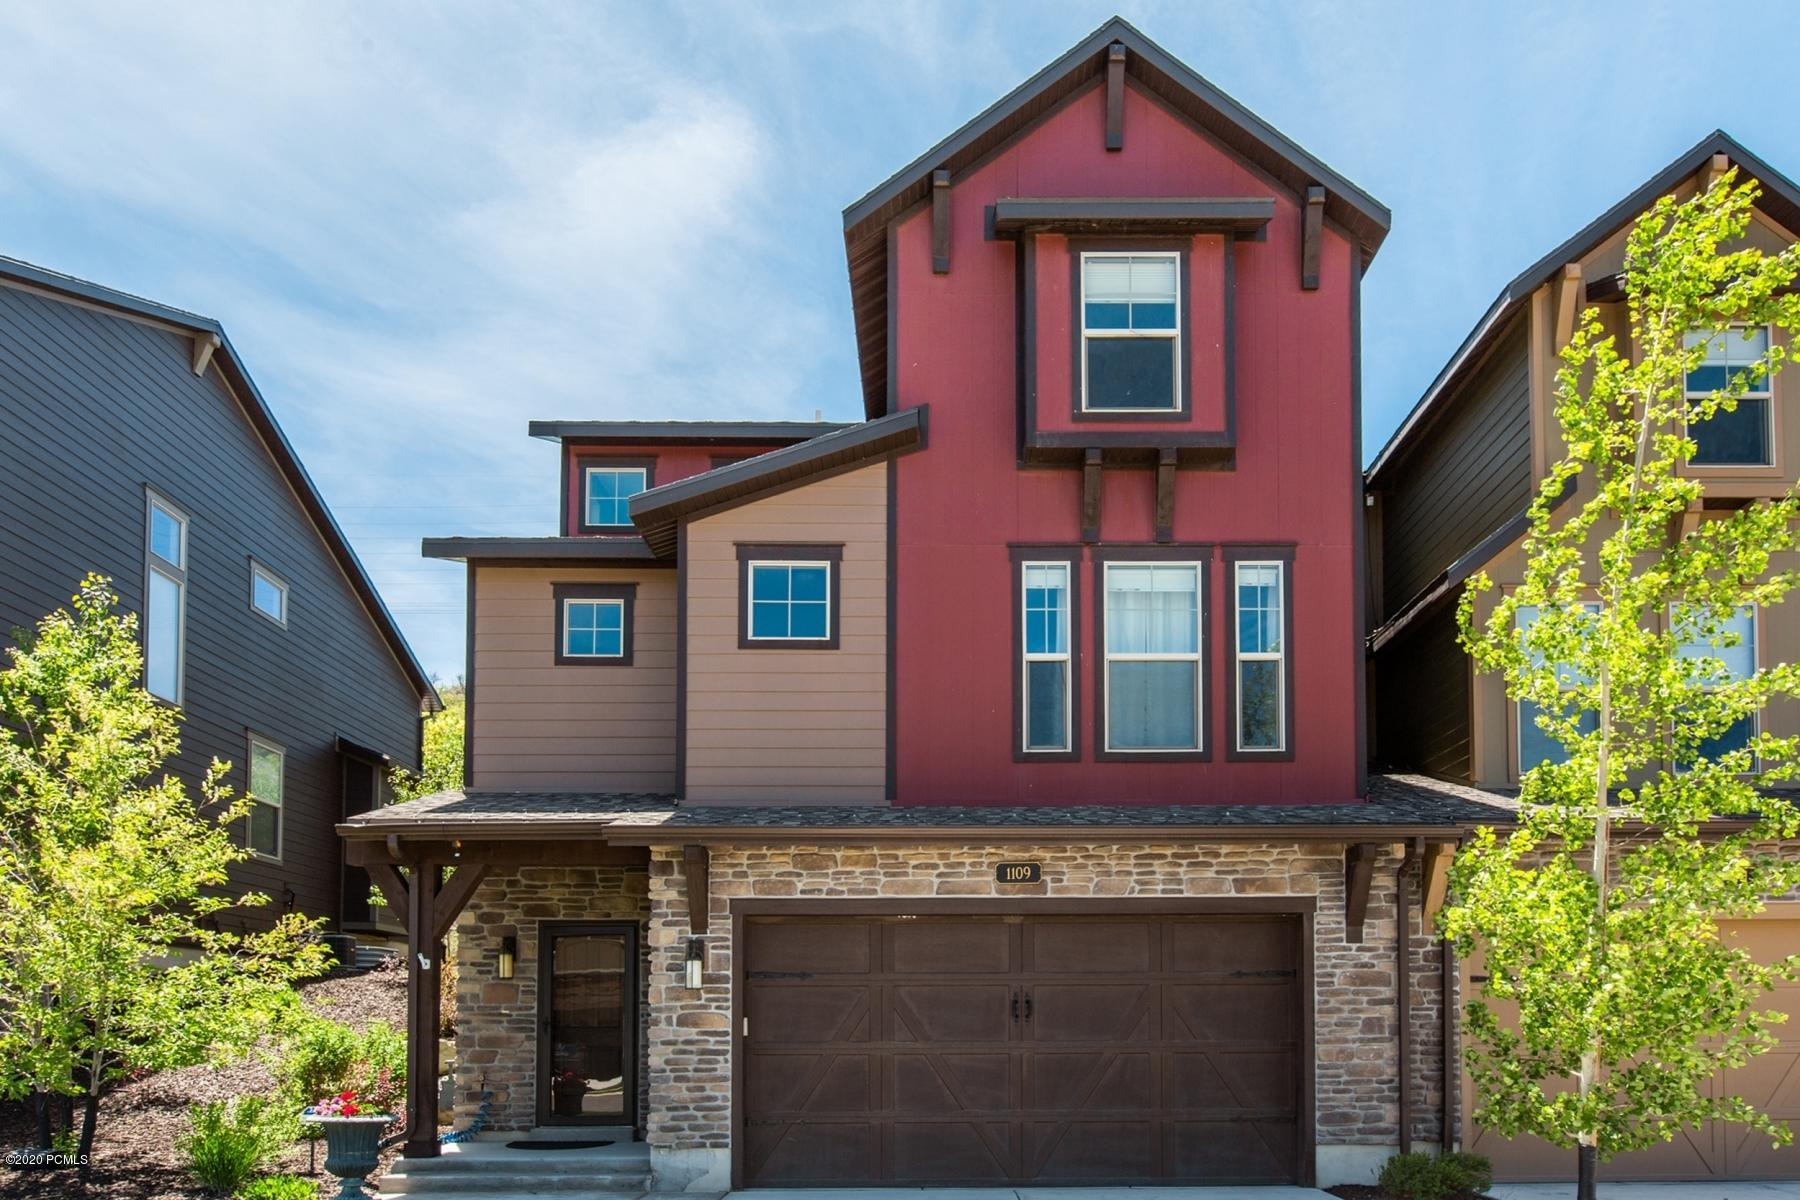 1109 W Abigail Drive, Kamas, Utah 84036, 4 Bedrooms Bedrooms, ,4 BathroomsBathrooms,Condominium,For Sale,W Abigail Drive,20190109112430415765000000